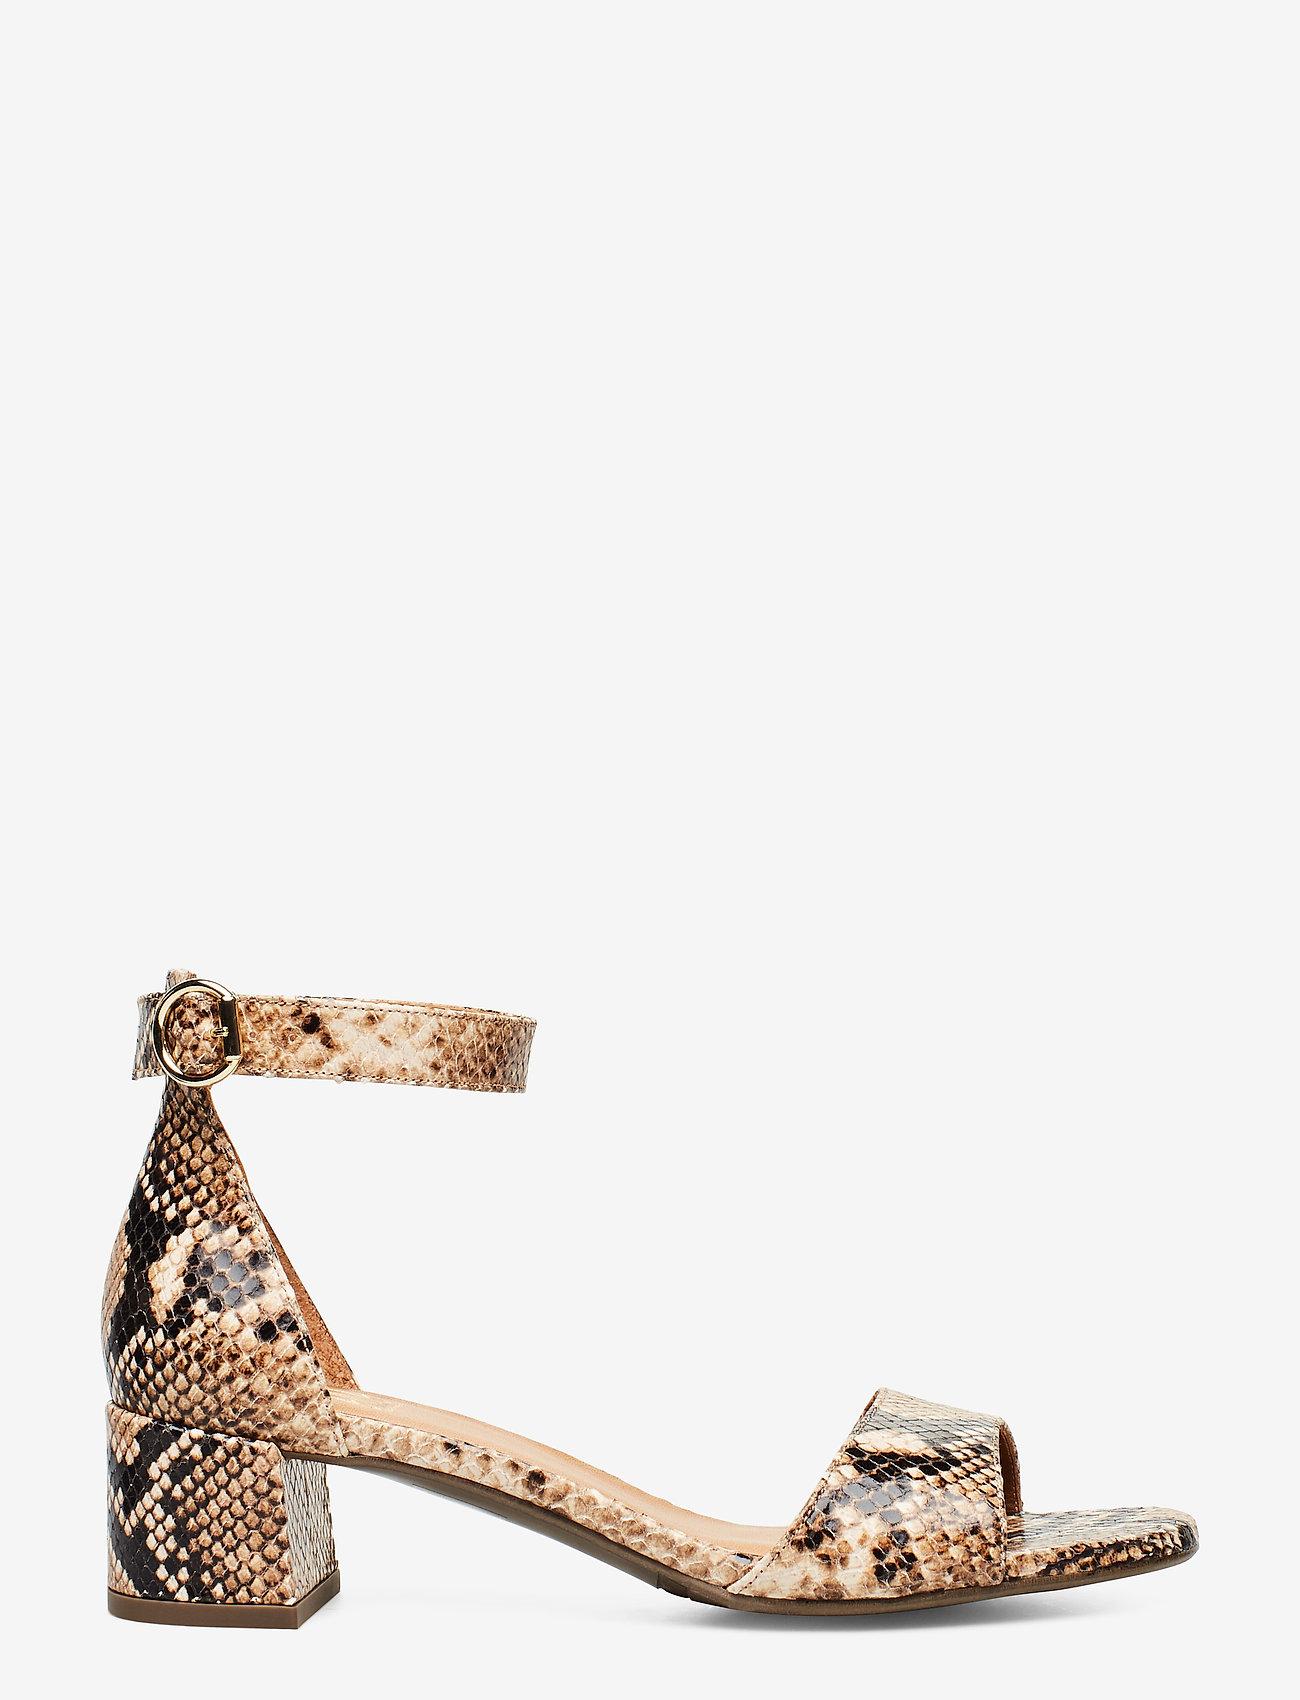 Billi Bi - Sandals 4607 - høyhælte sandaler - beige 6071 snake 34 p - 1